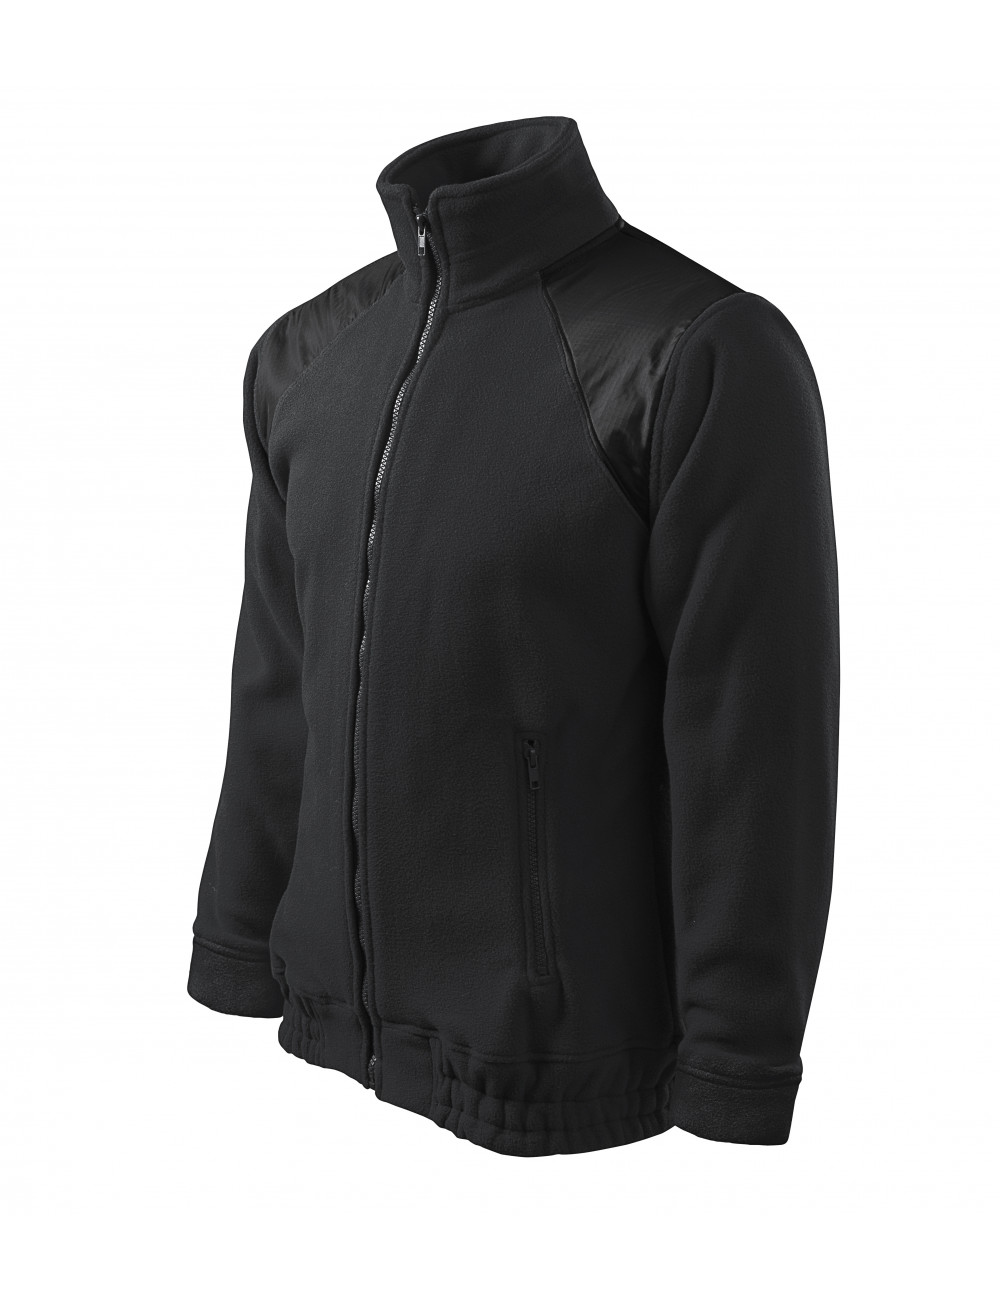 Adler RIMECK Polar unisex Jacket Hi-Q 506 ebony gray